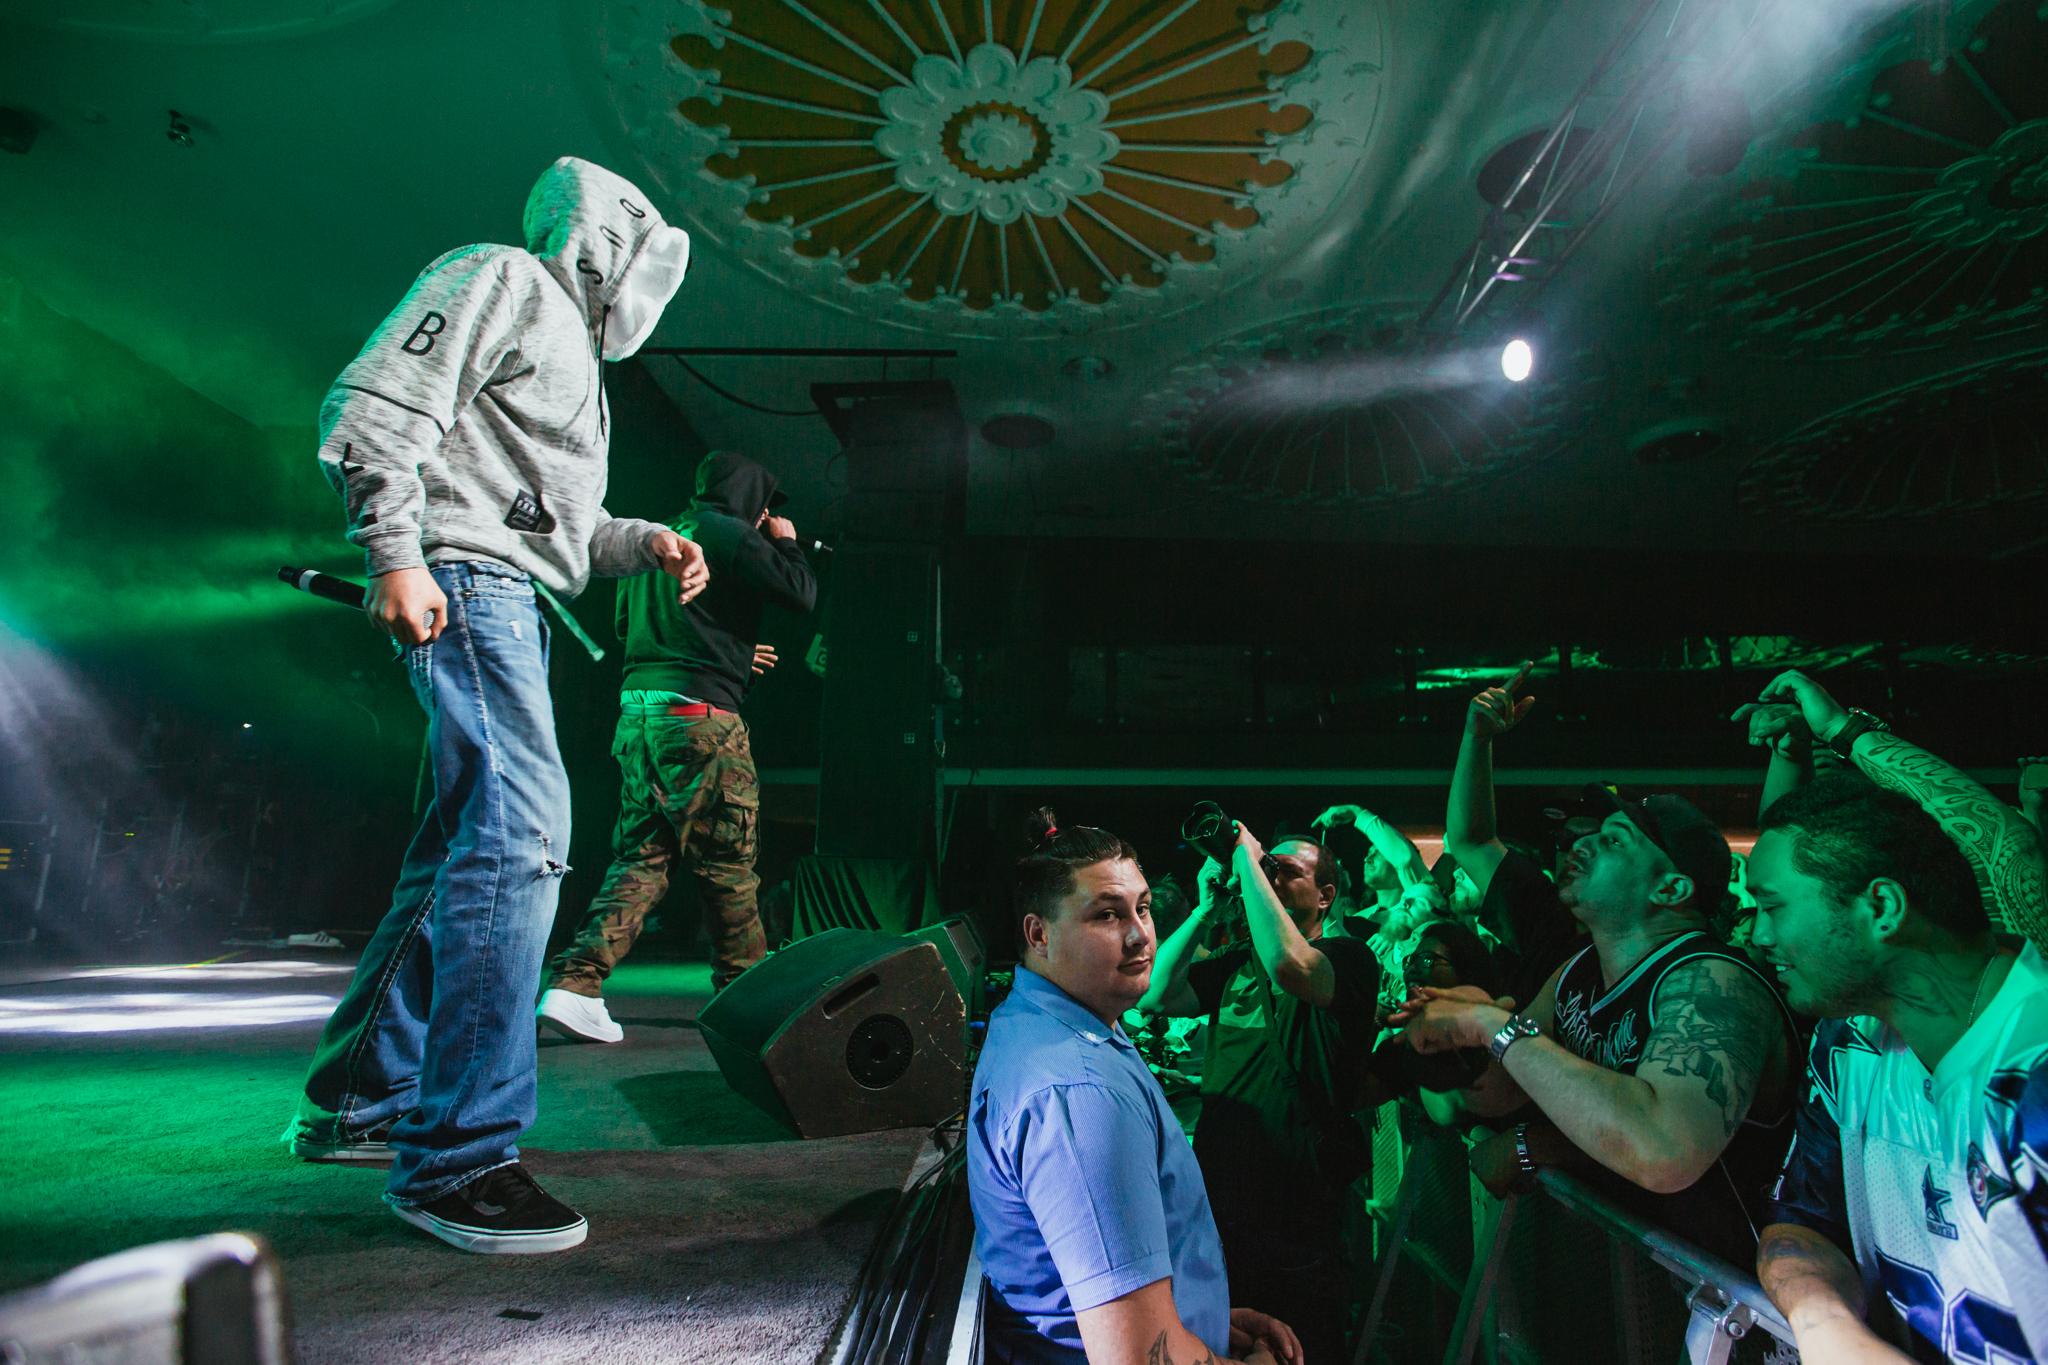 Mitch Lowe Photo - Methodman & Redman-14.jpg